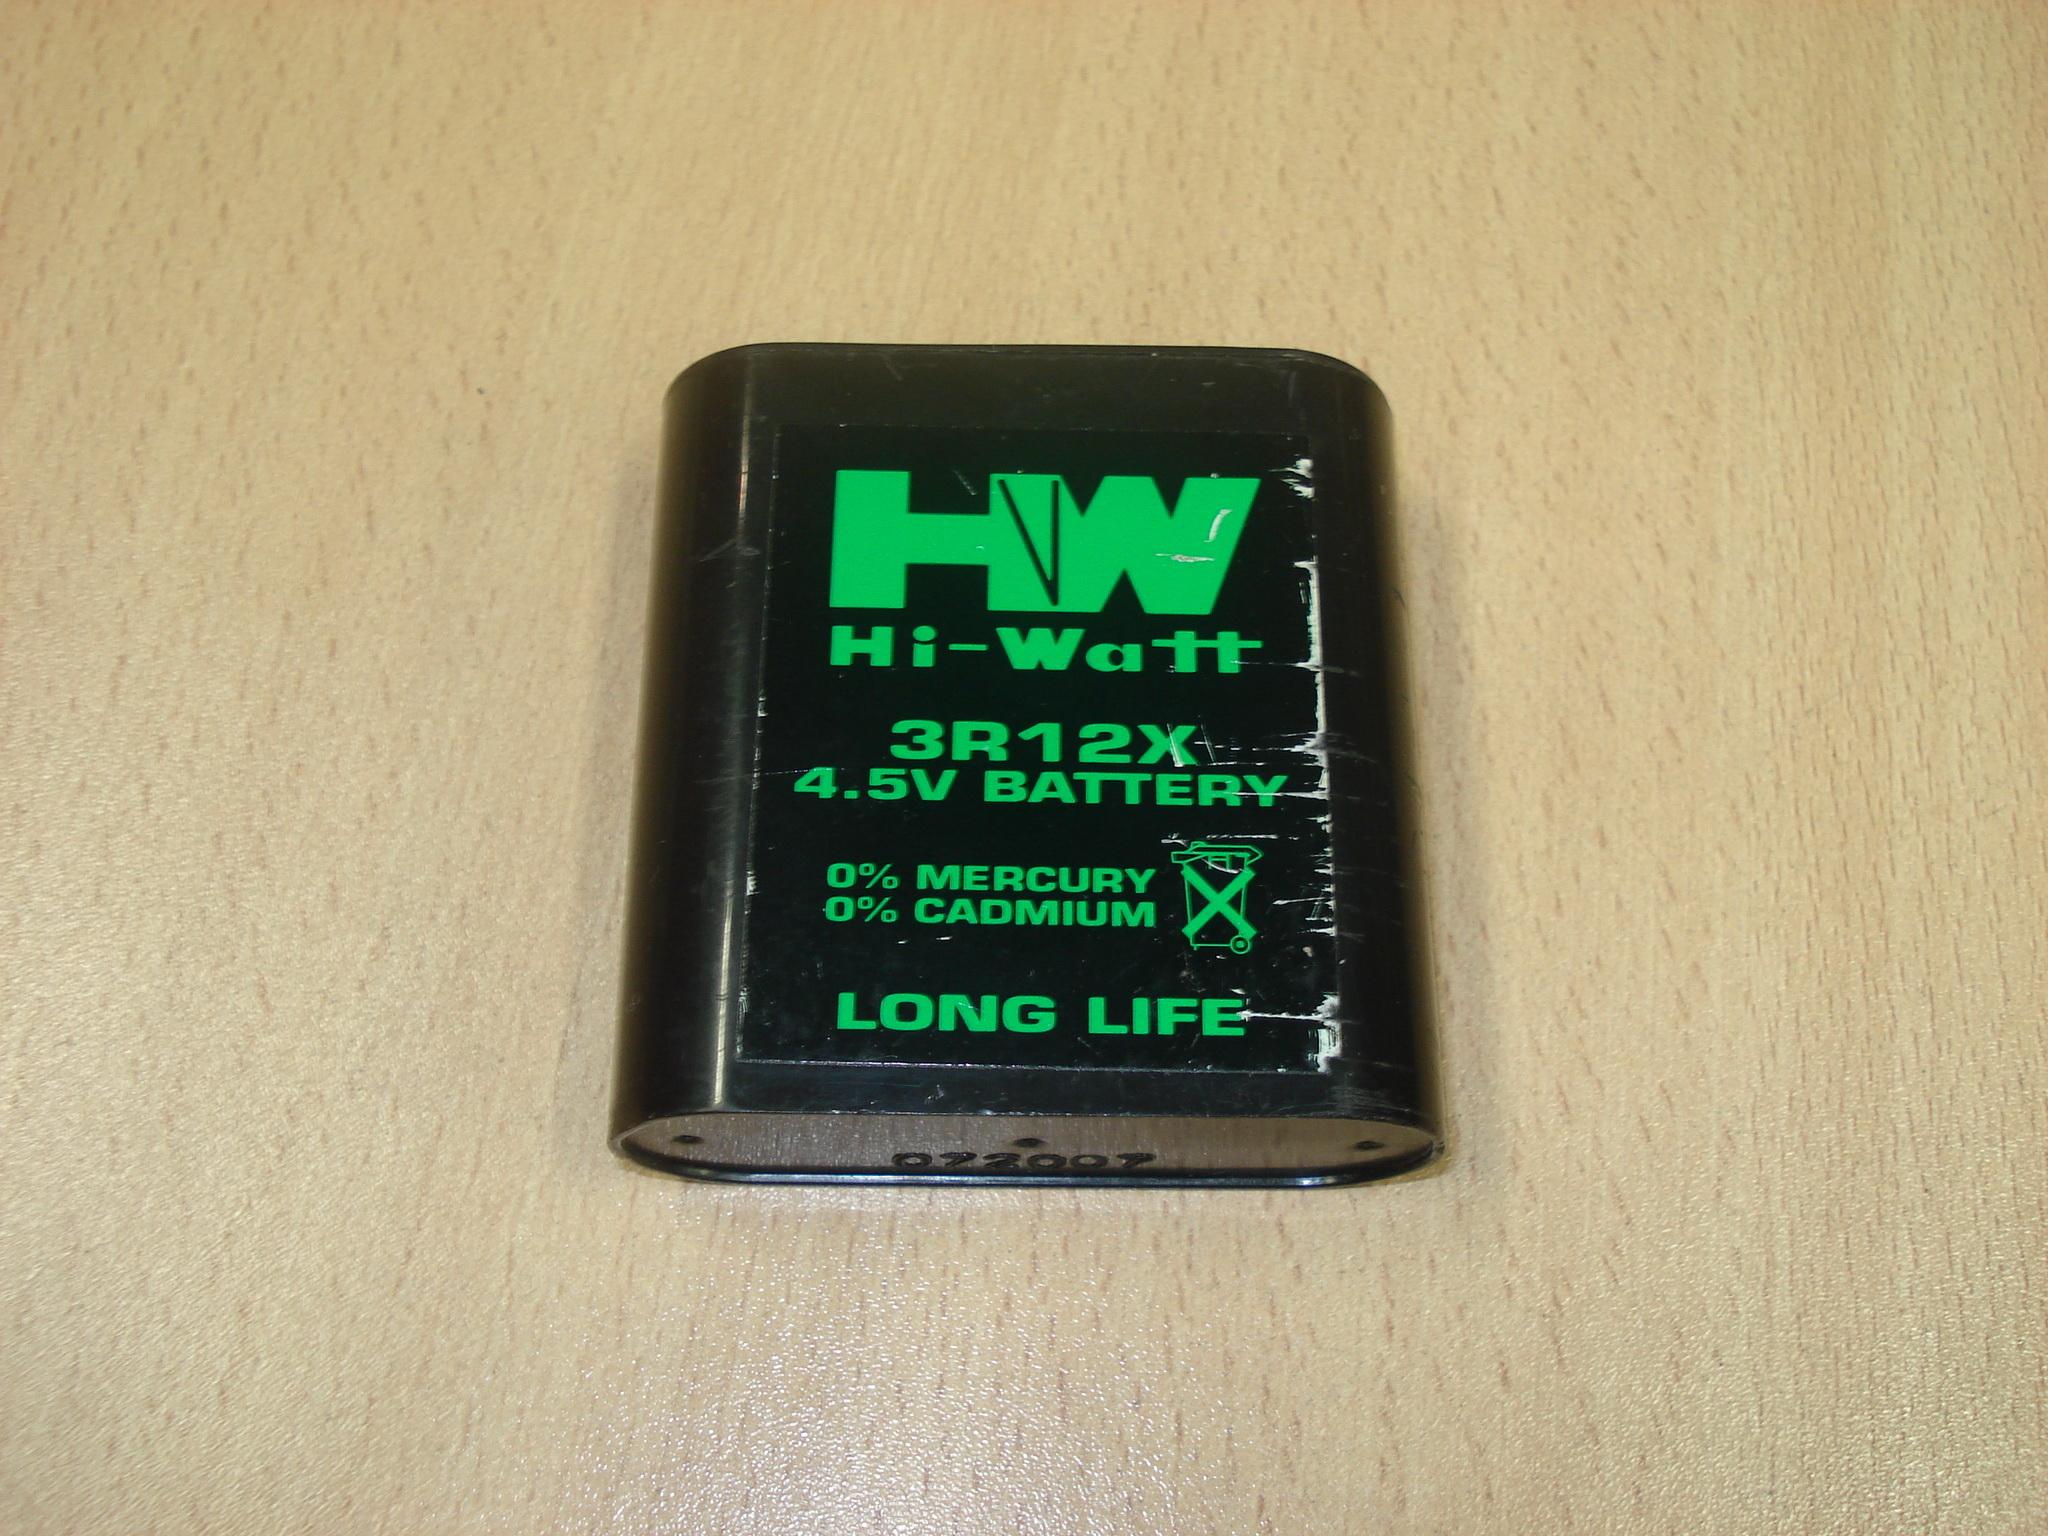 Pila HI-WATT 3R 12 x 4,5V